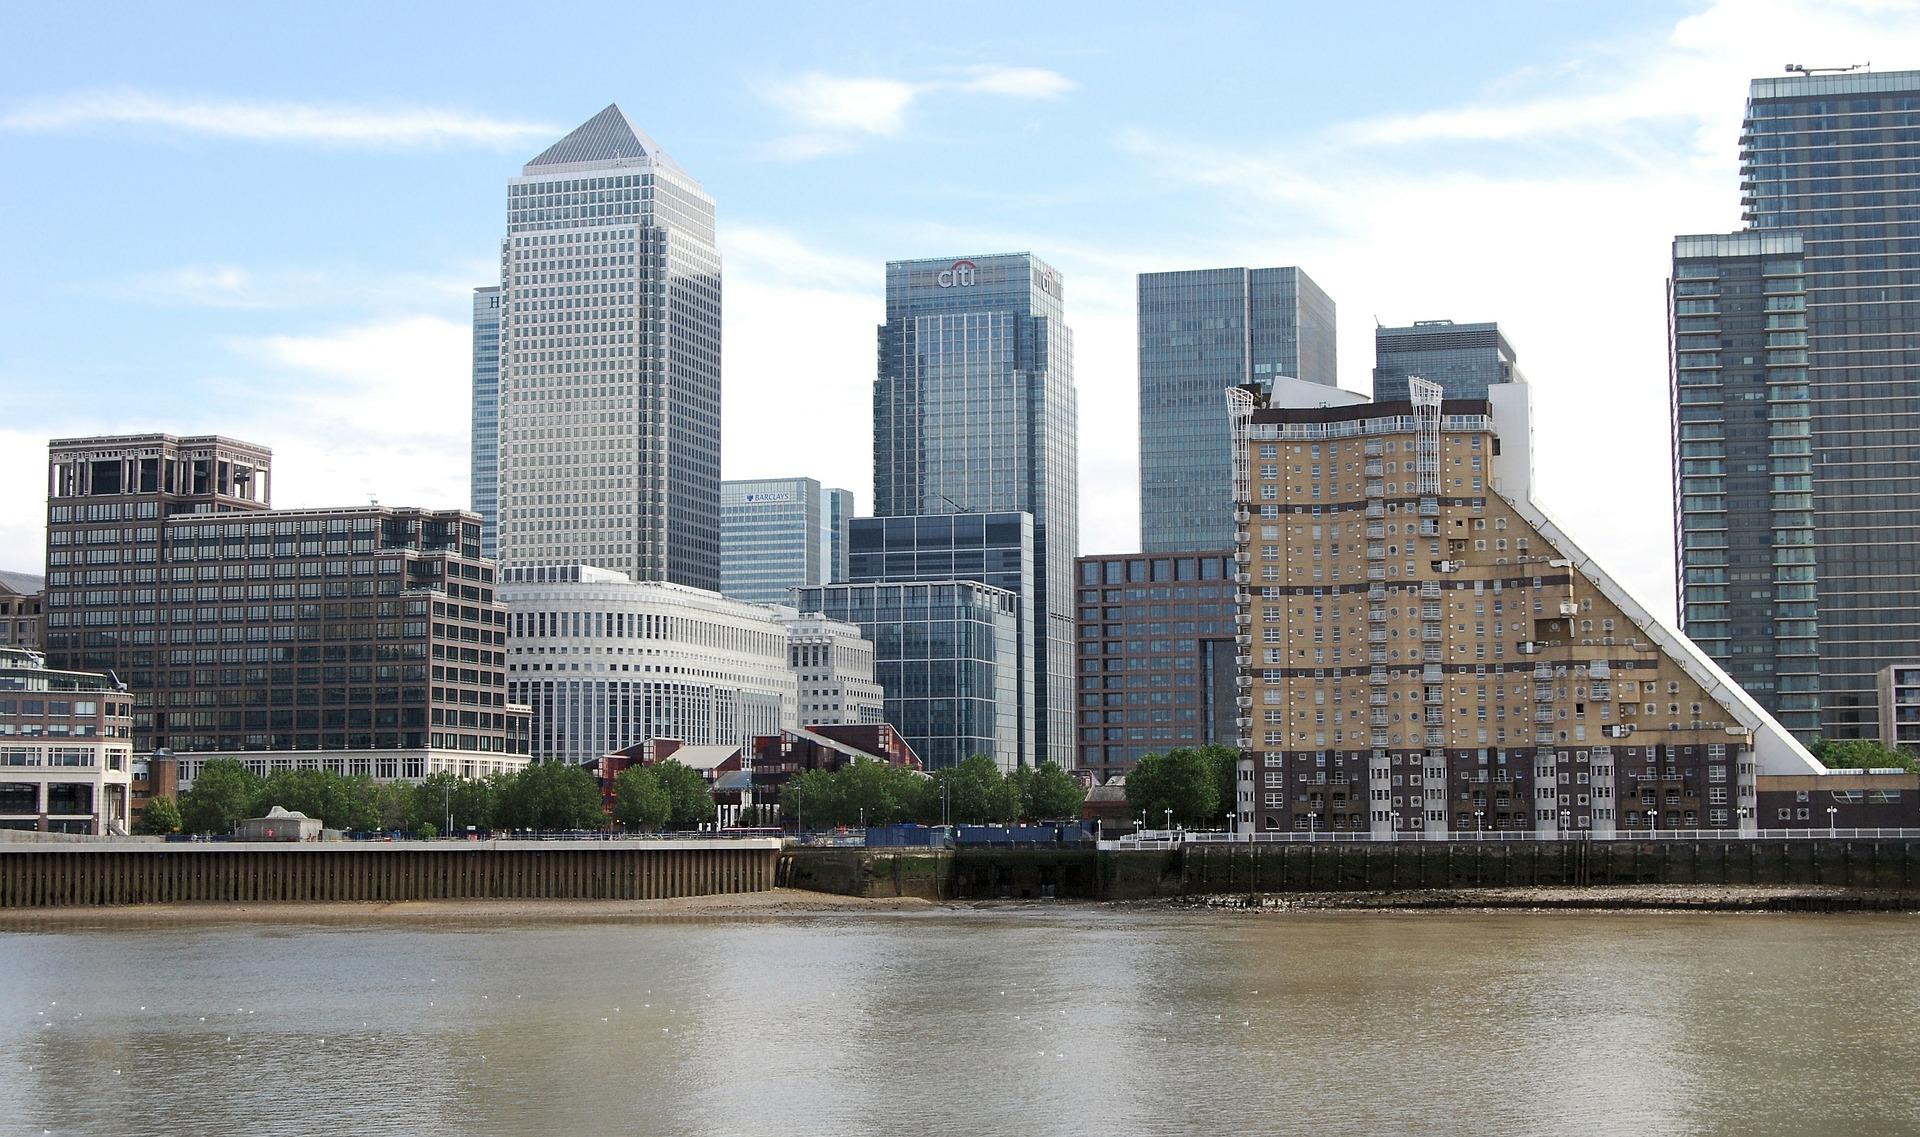 How to get a Skilled Worker Visa under UK Points-Based Immigration System